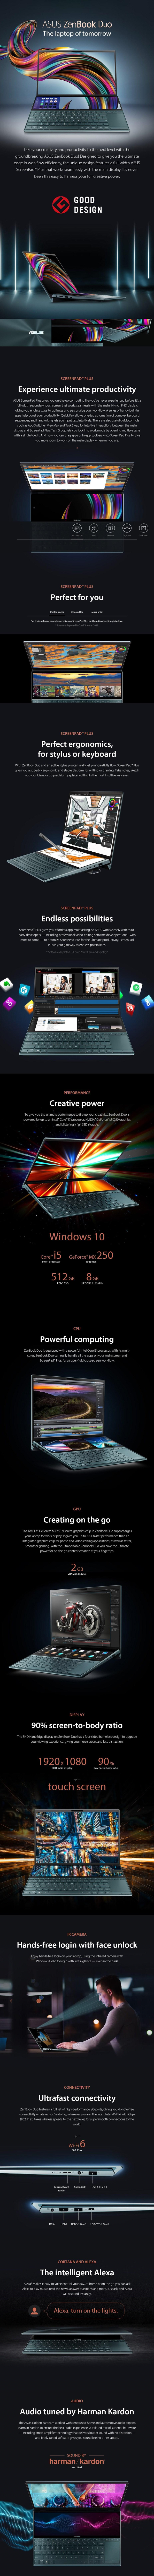 asus-zenbook-duo-ux481fl-14-laptop-i510210u-8gb-512gb-mx250-w10h-touch-ac33636-5.jpg